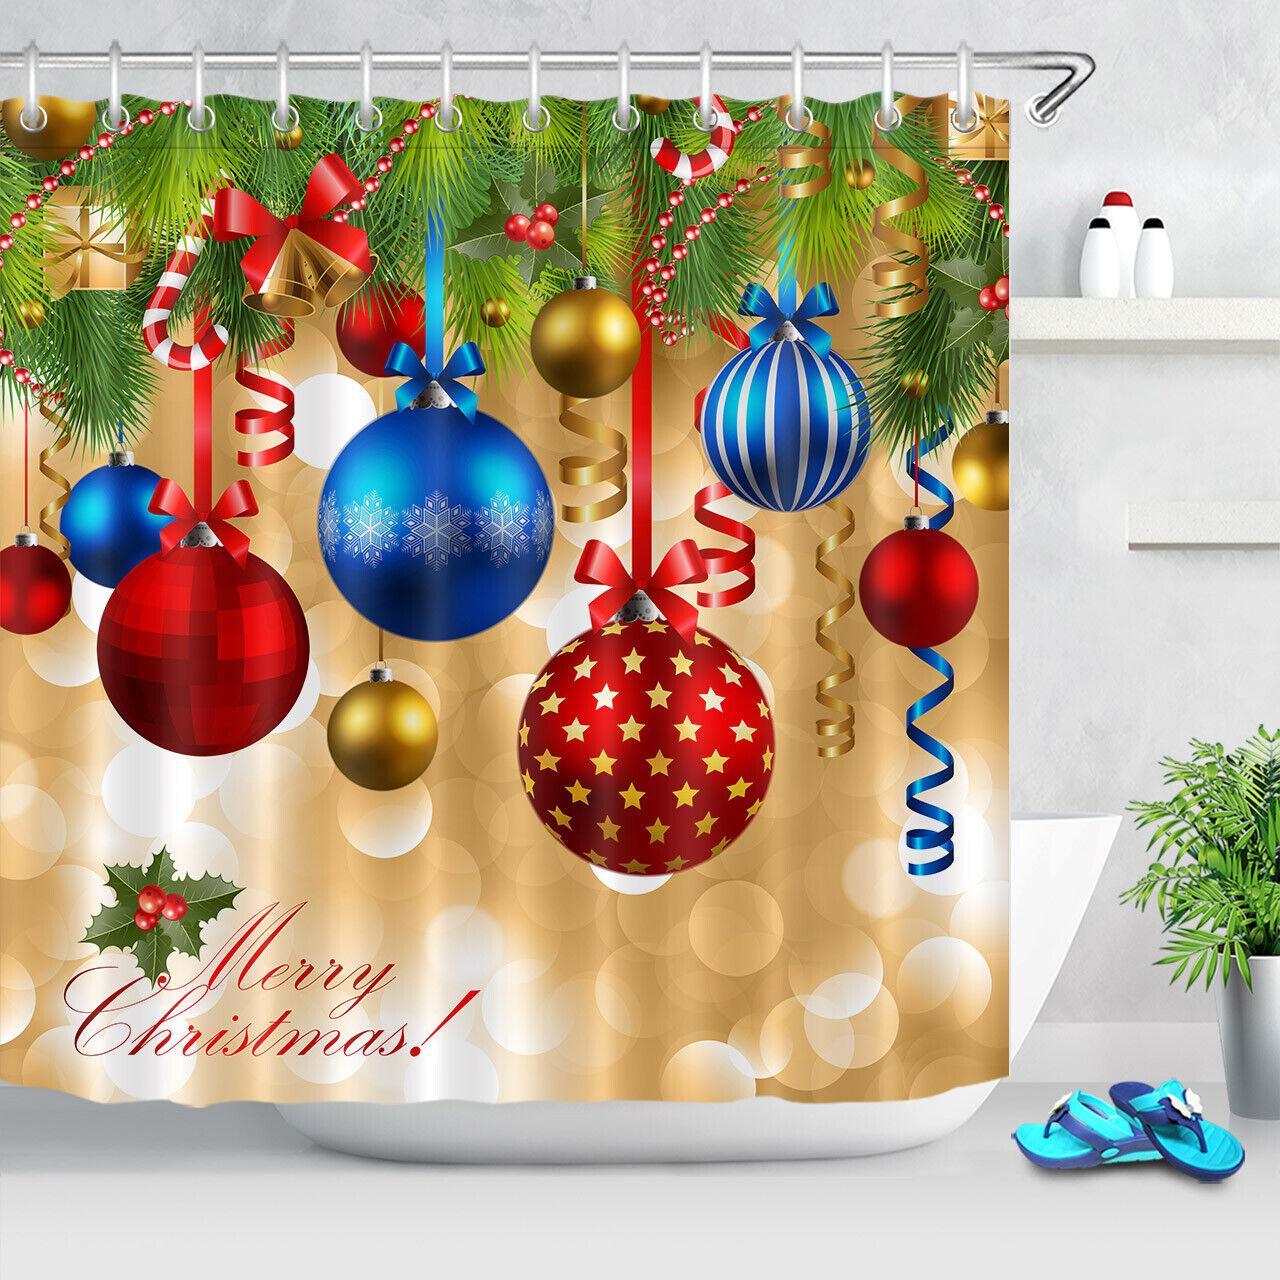 Us Xmas Tree Baubles Fireplace Socks Fabric Shower Curtain Set Bathroom Decor